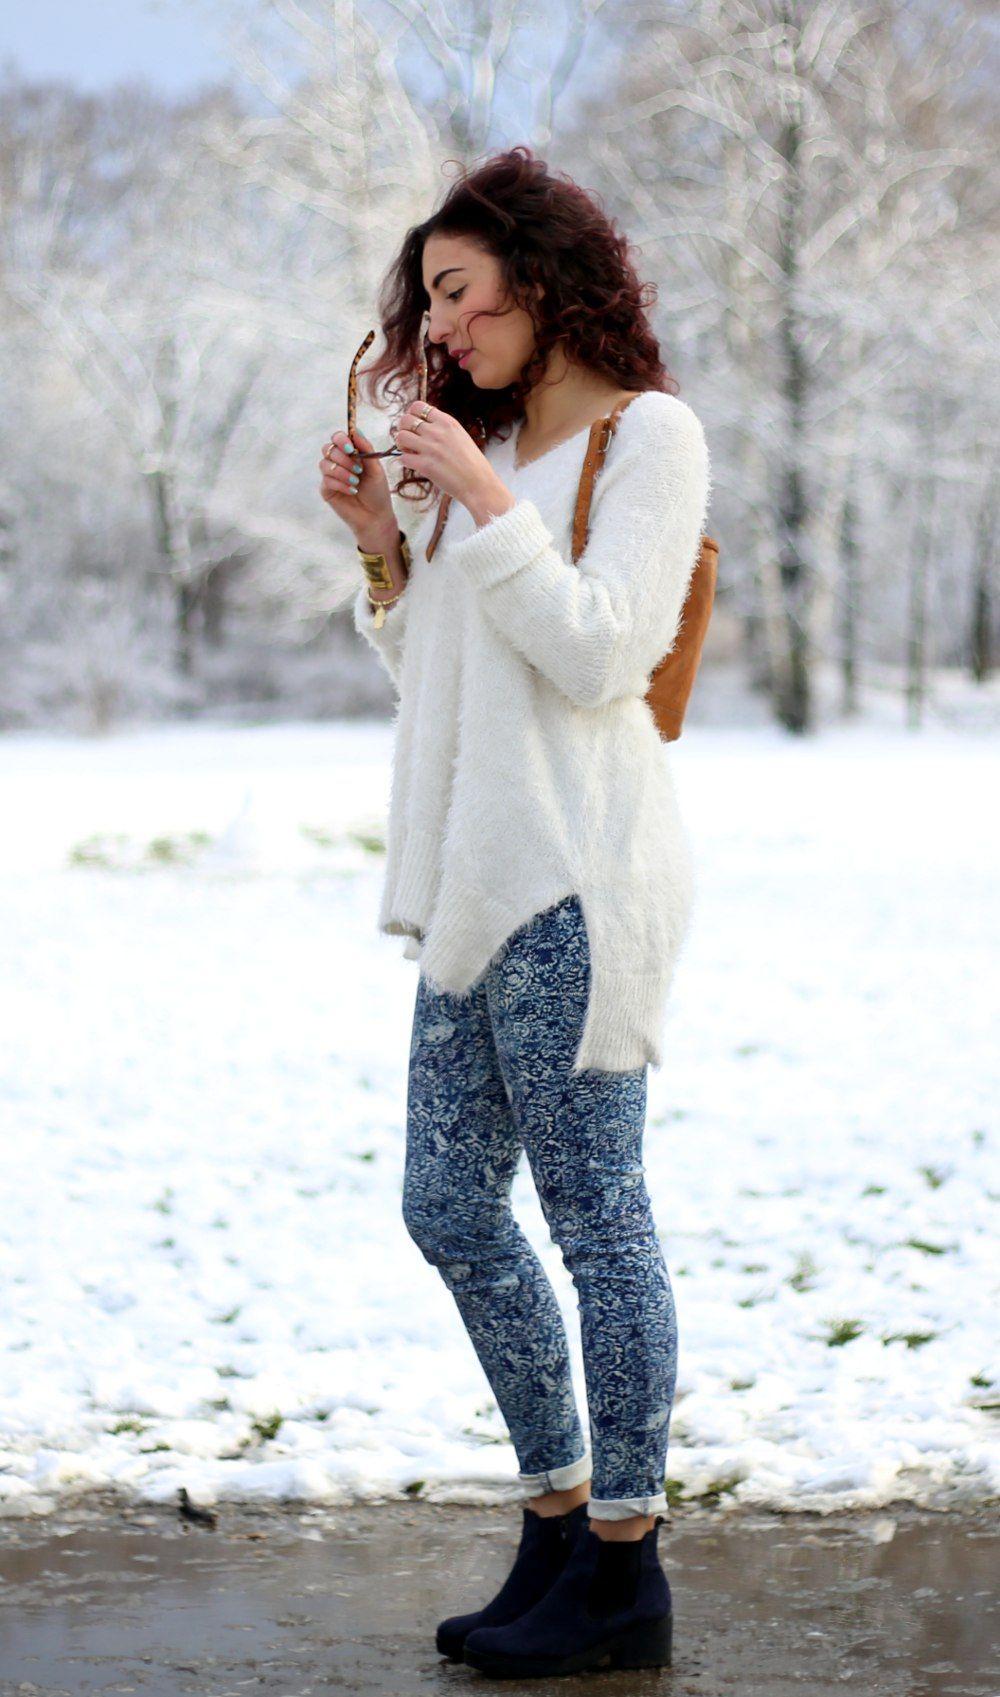 Paisley Jeans Outfit // For more inspiration visit samieze.com fashion blog